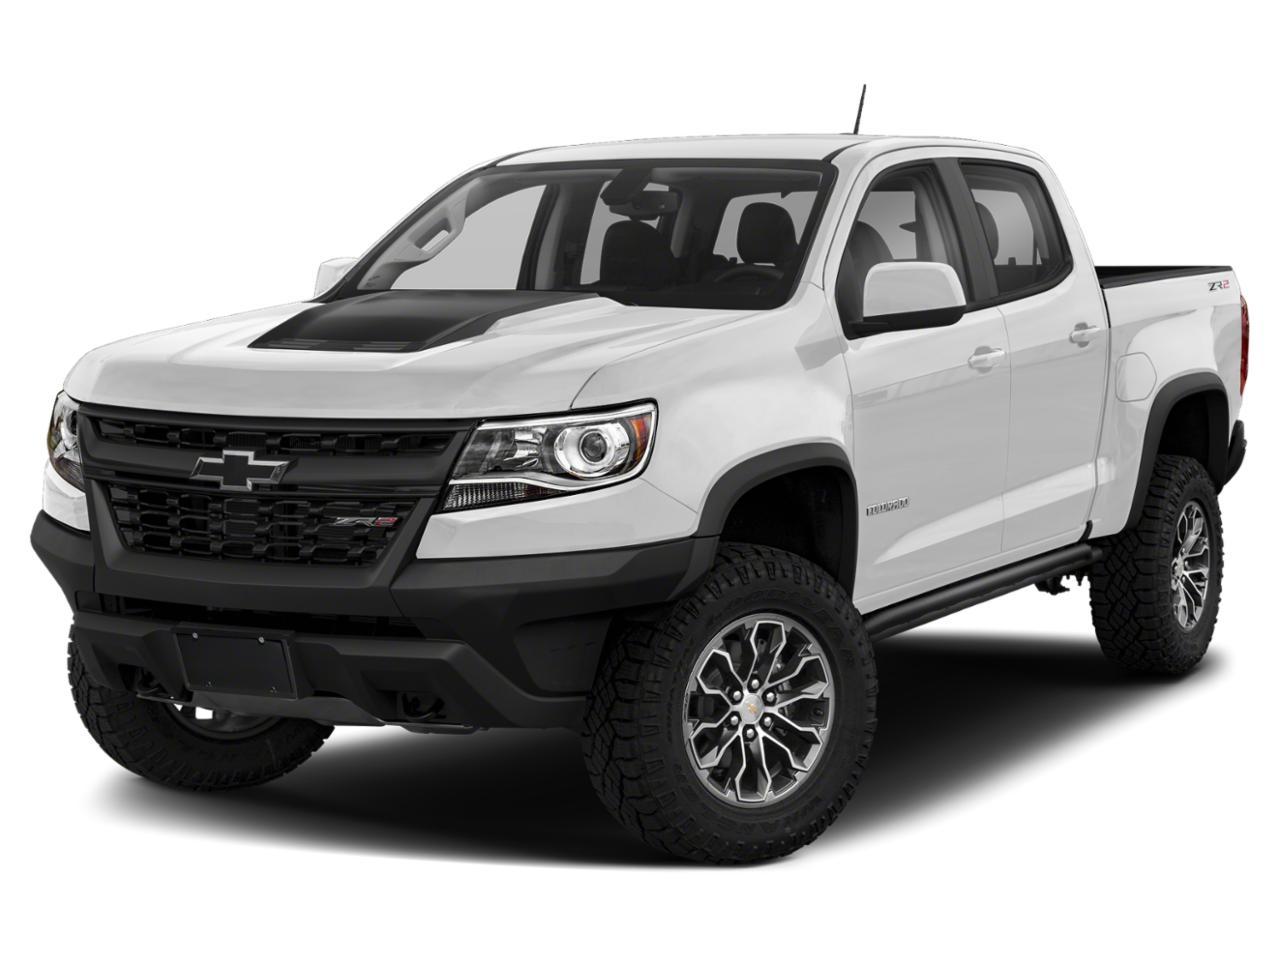 2020 Chevrolet Colorado Vehicle Photo in Washington, NJ 07882